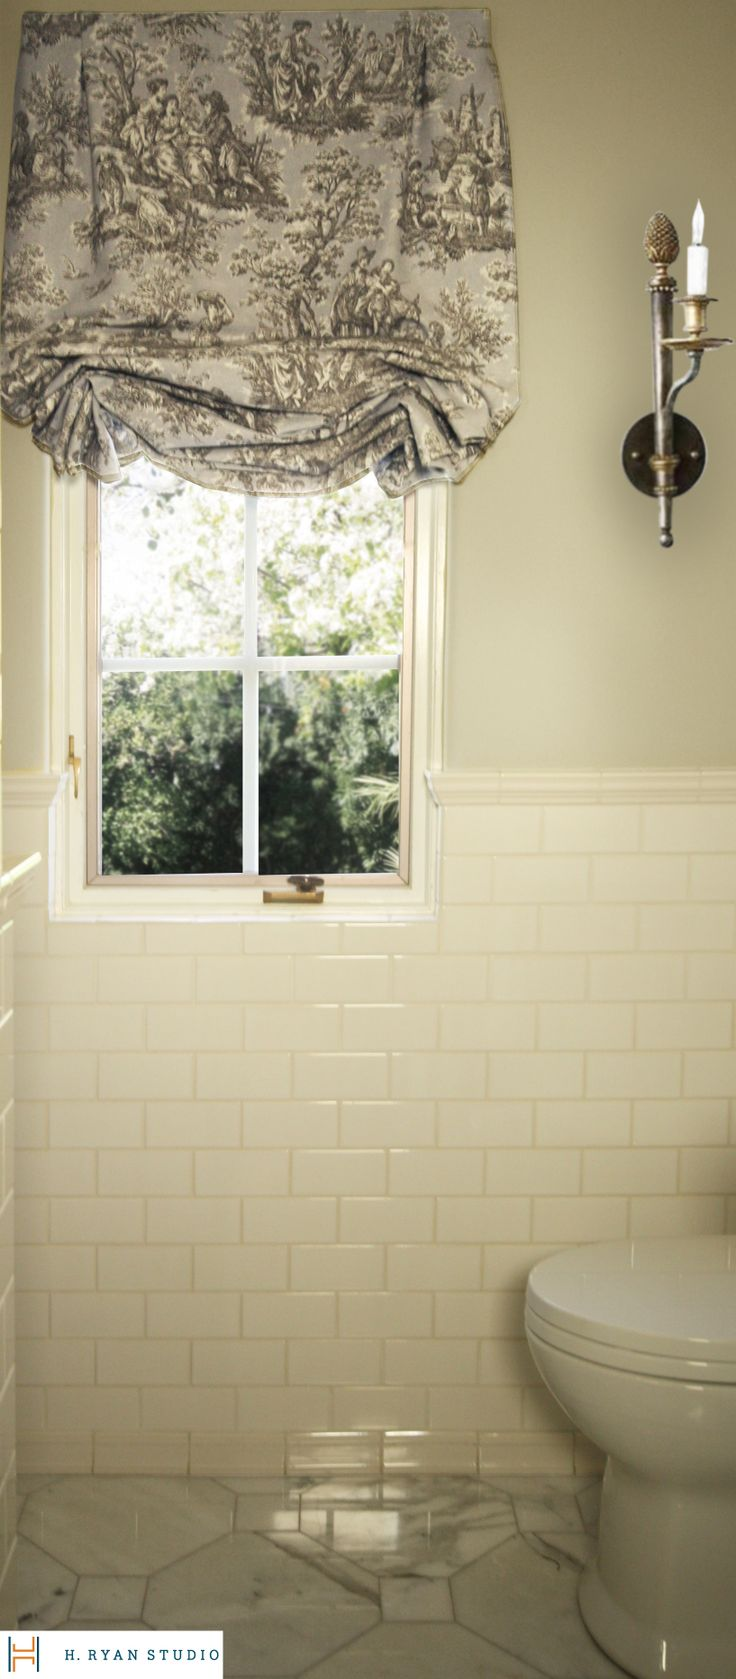 Craftsman style bathroom lighting - H Ryan Studio European Mission Style Bathroom W Custom Window Treatment Www